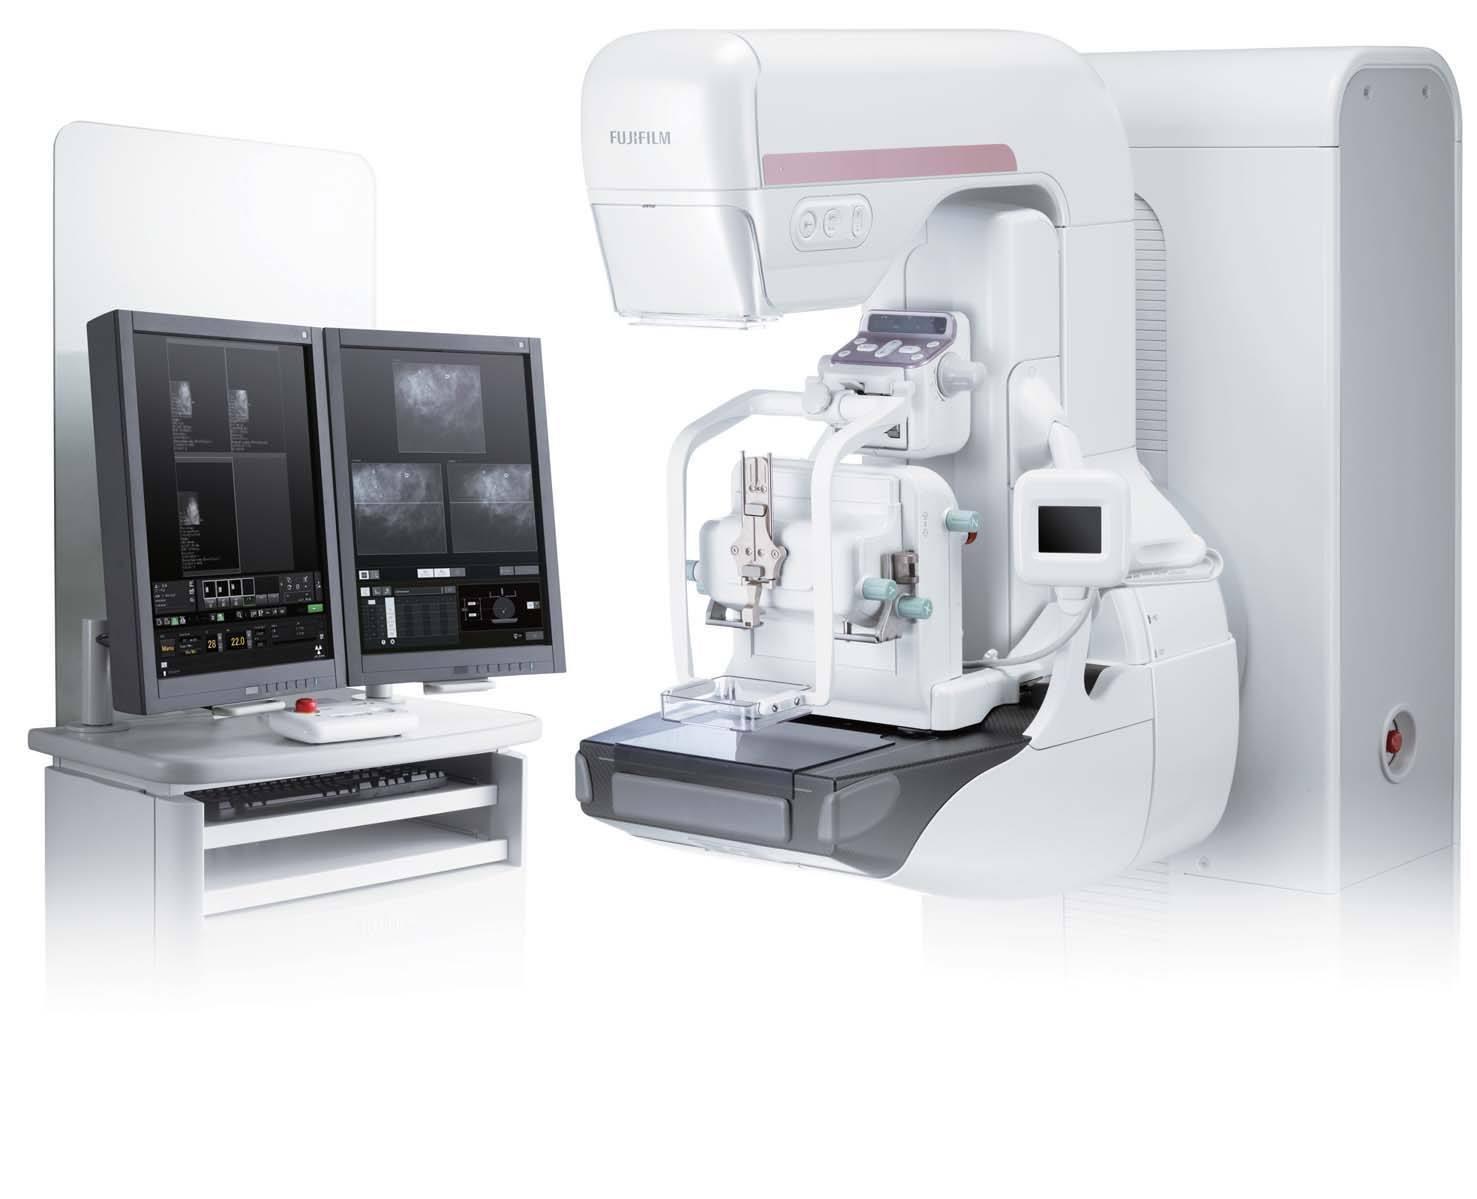 Digital tomosynthesis mammography